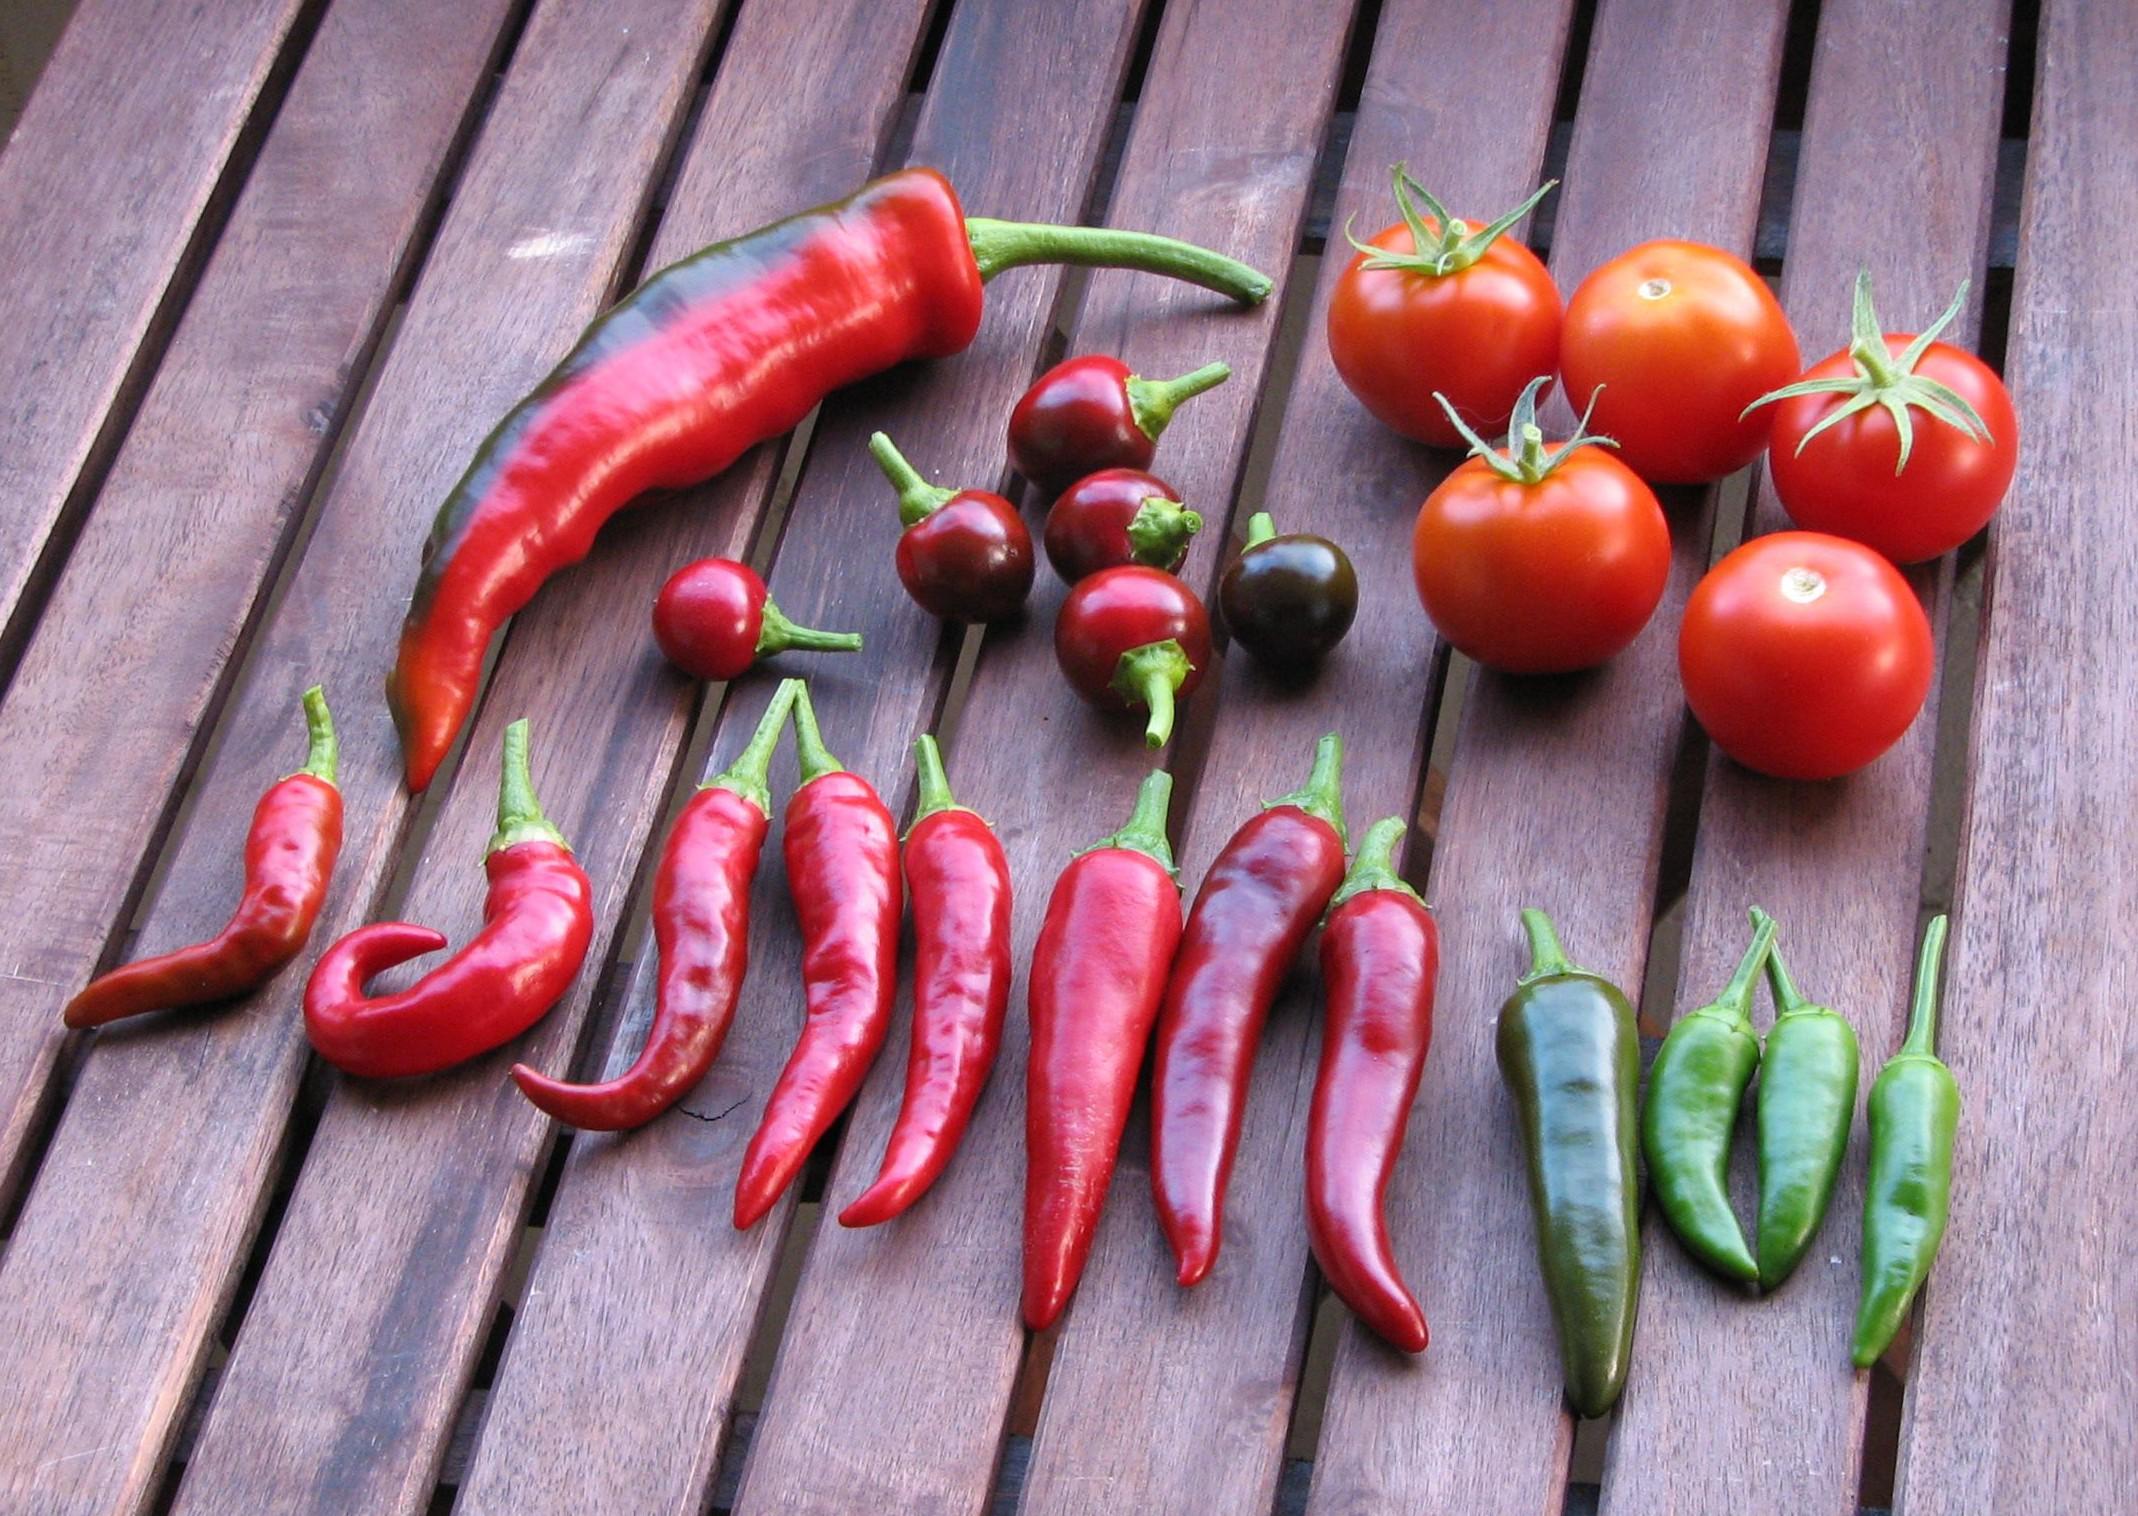 Organic Vs Conventional Food